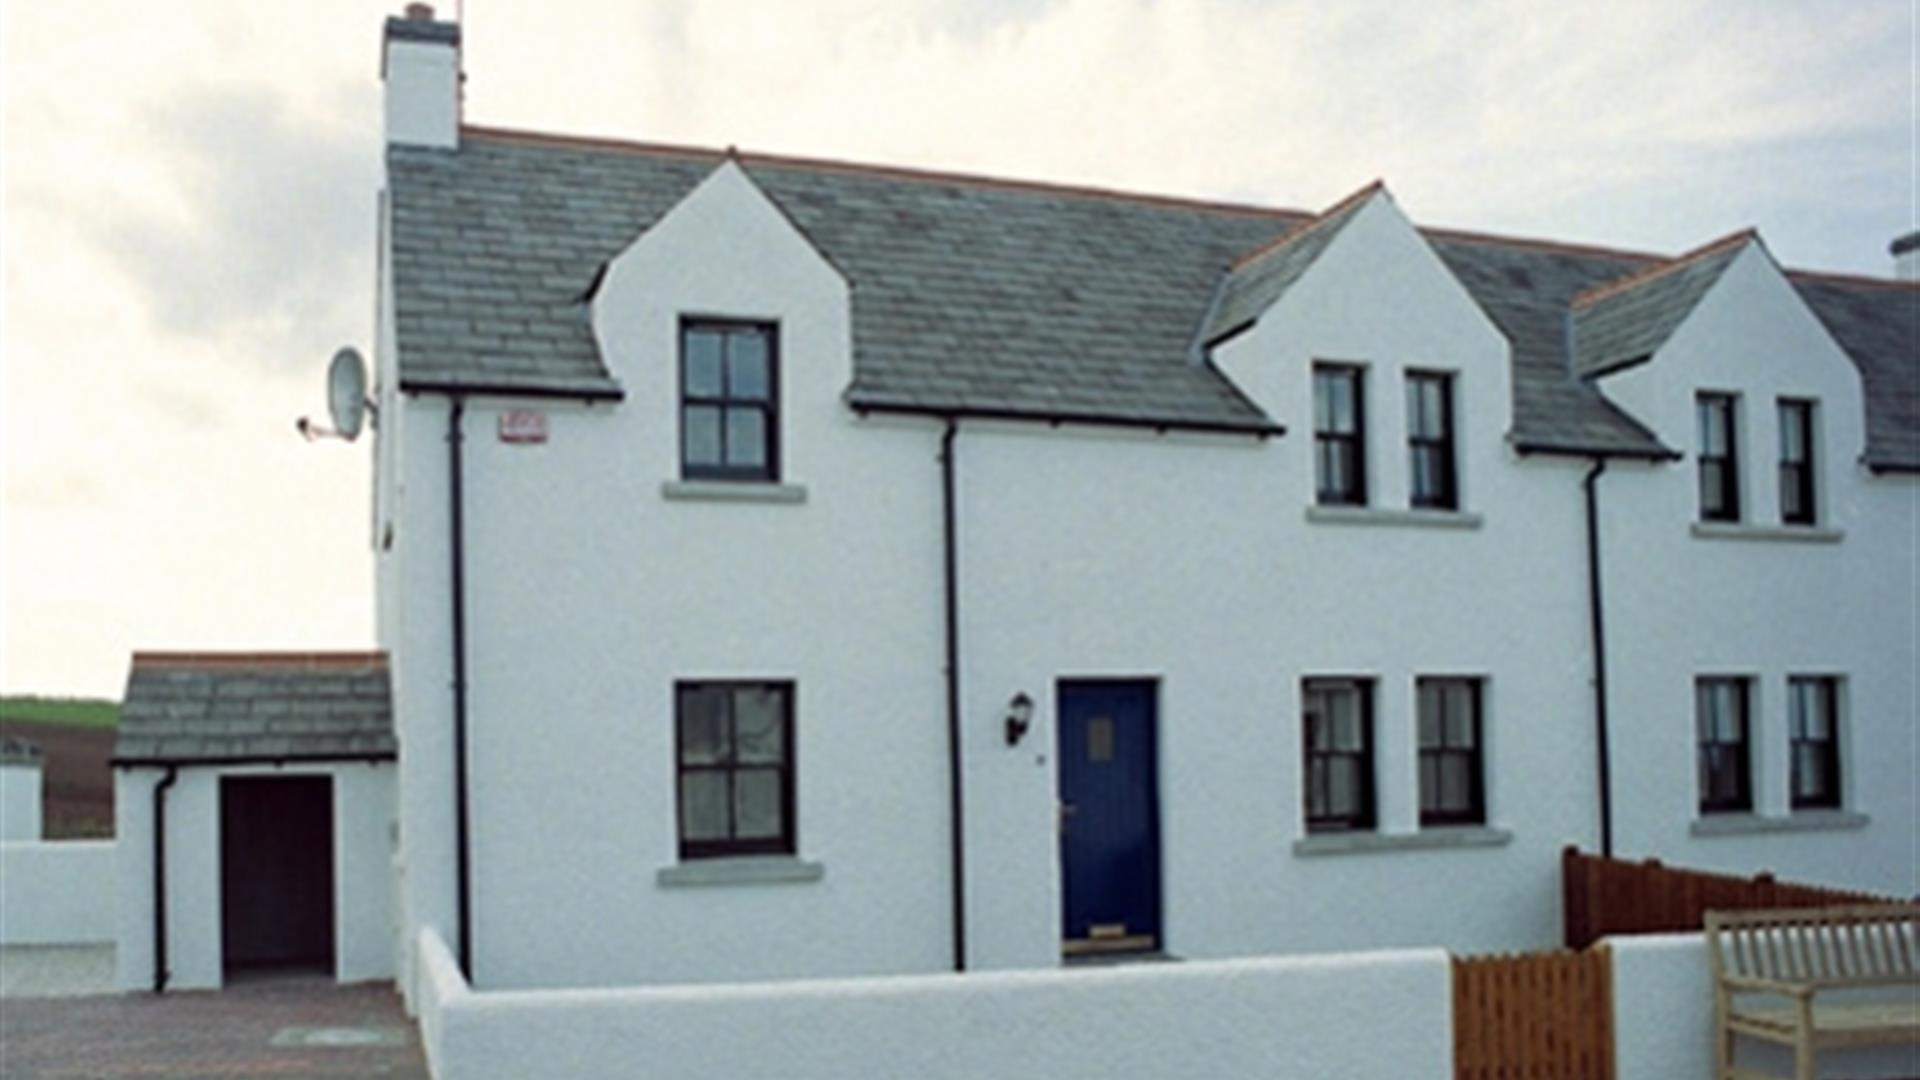 McShane Glen Leisure Homes - The Chalet No.6